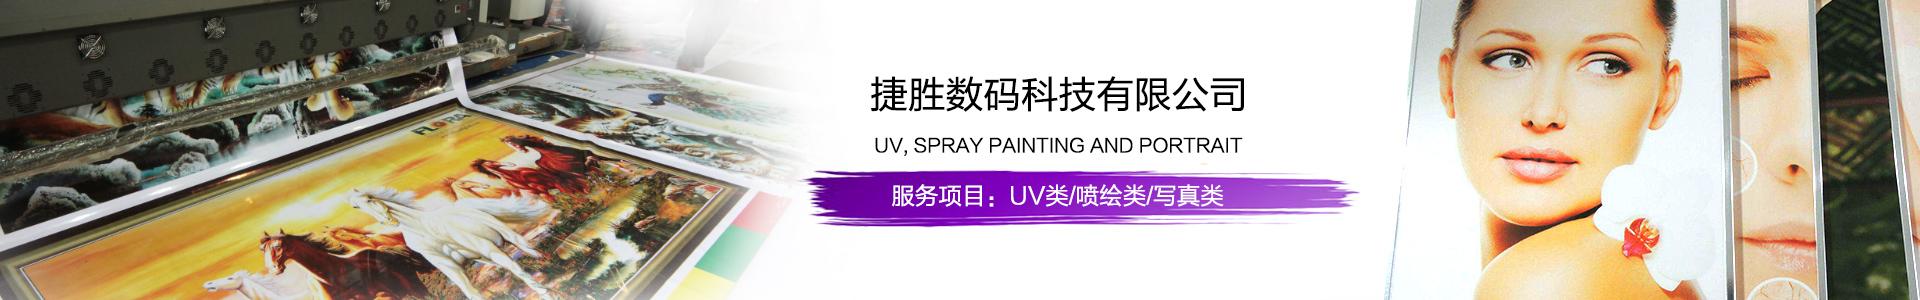 UV刀刮布无缝拼接